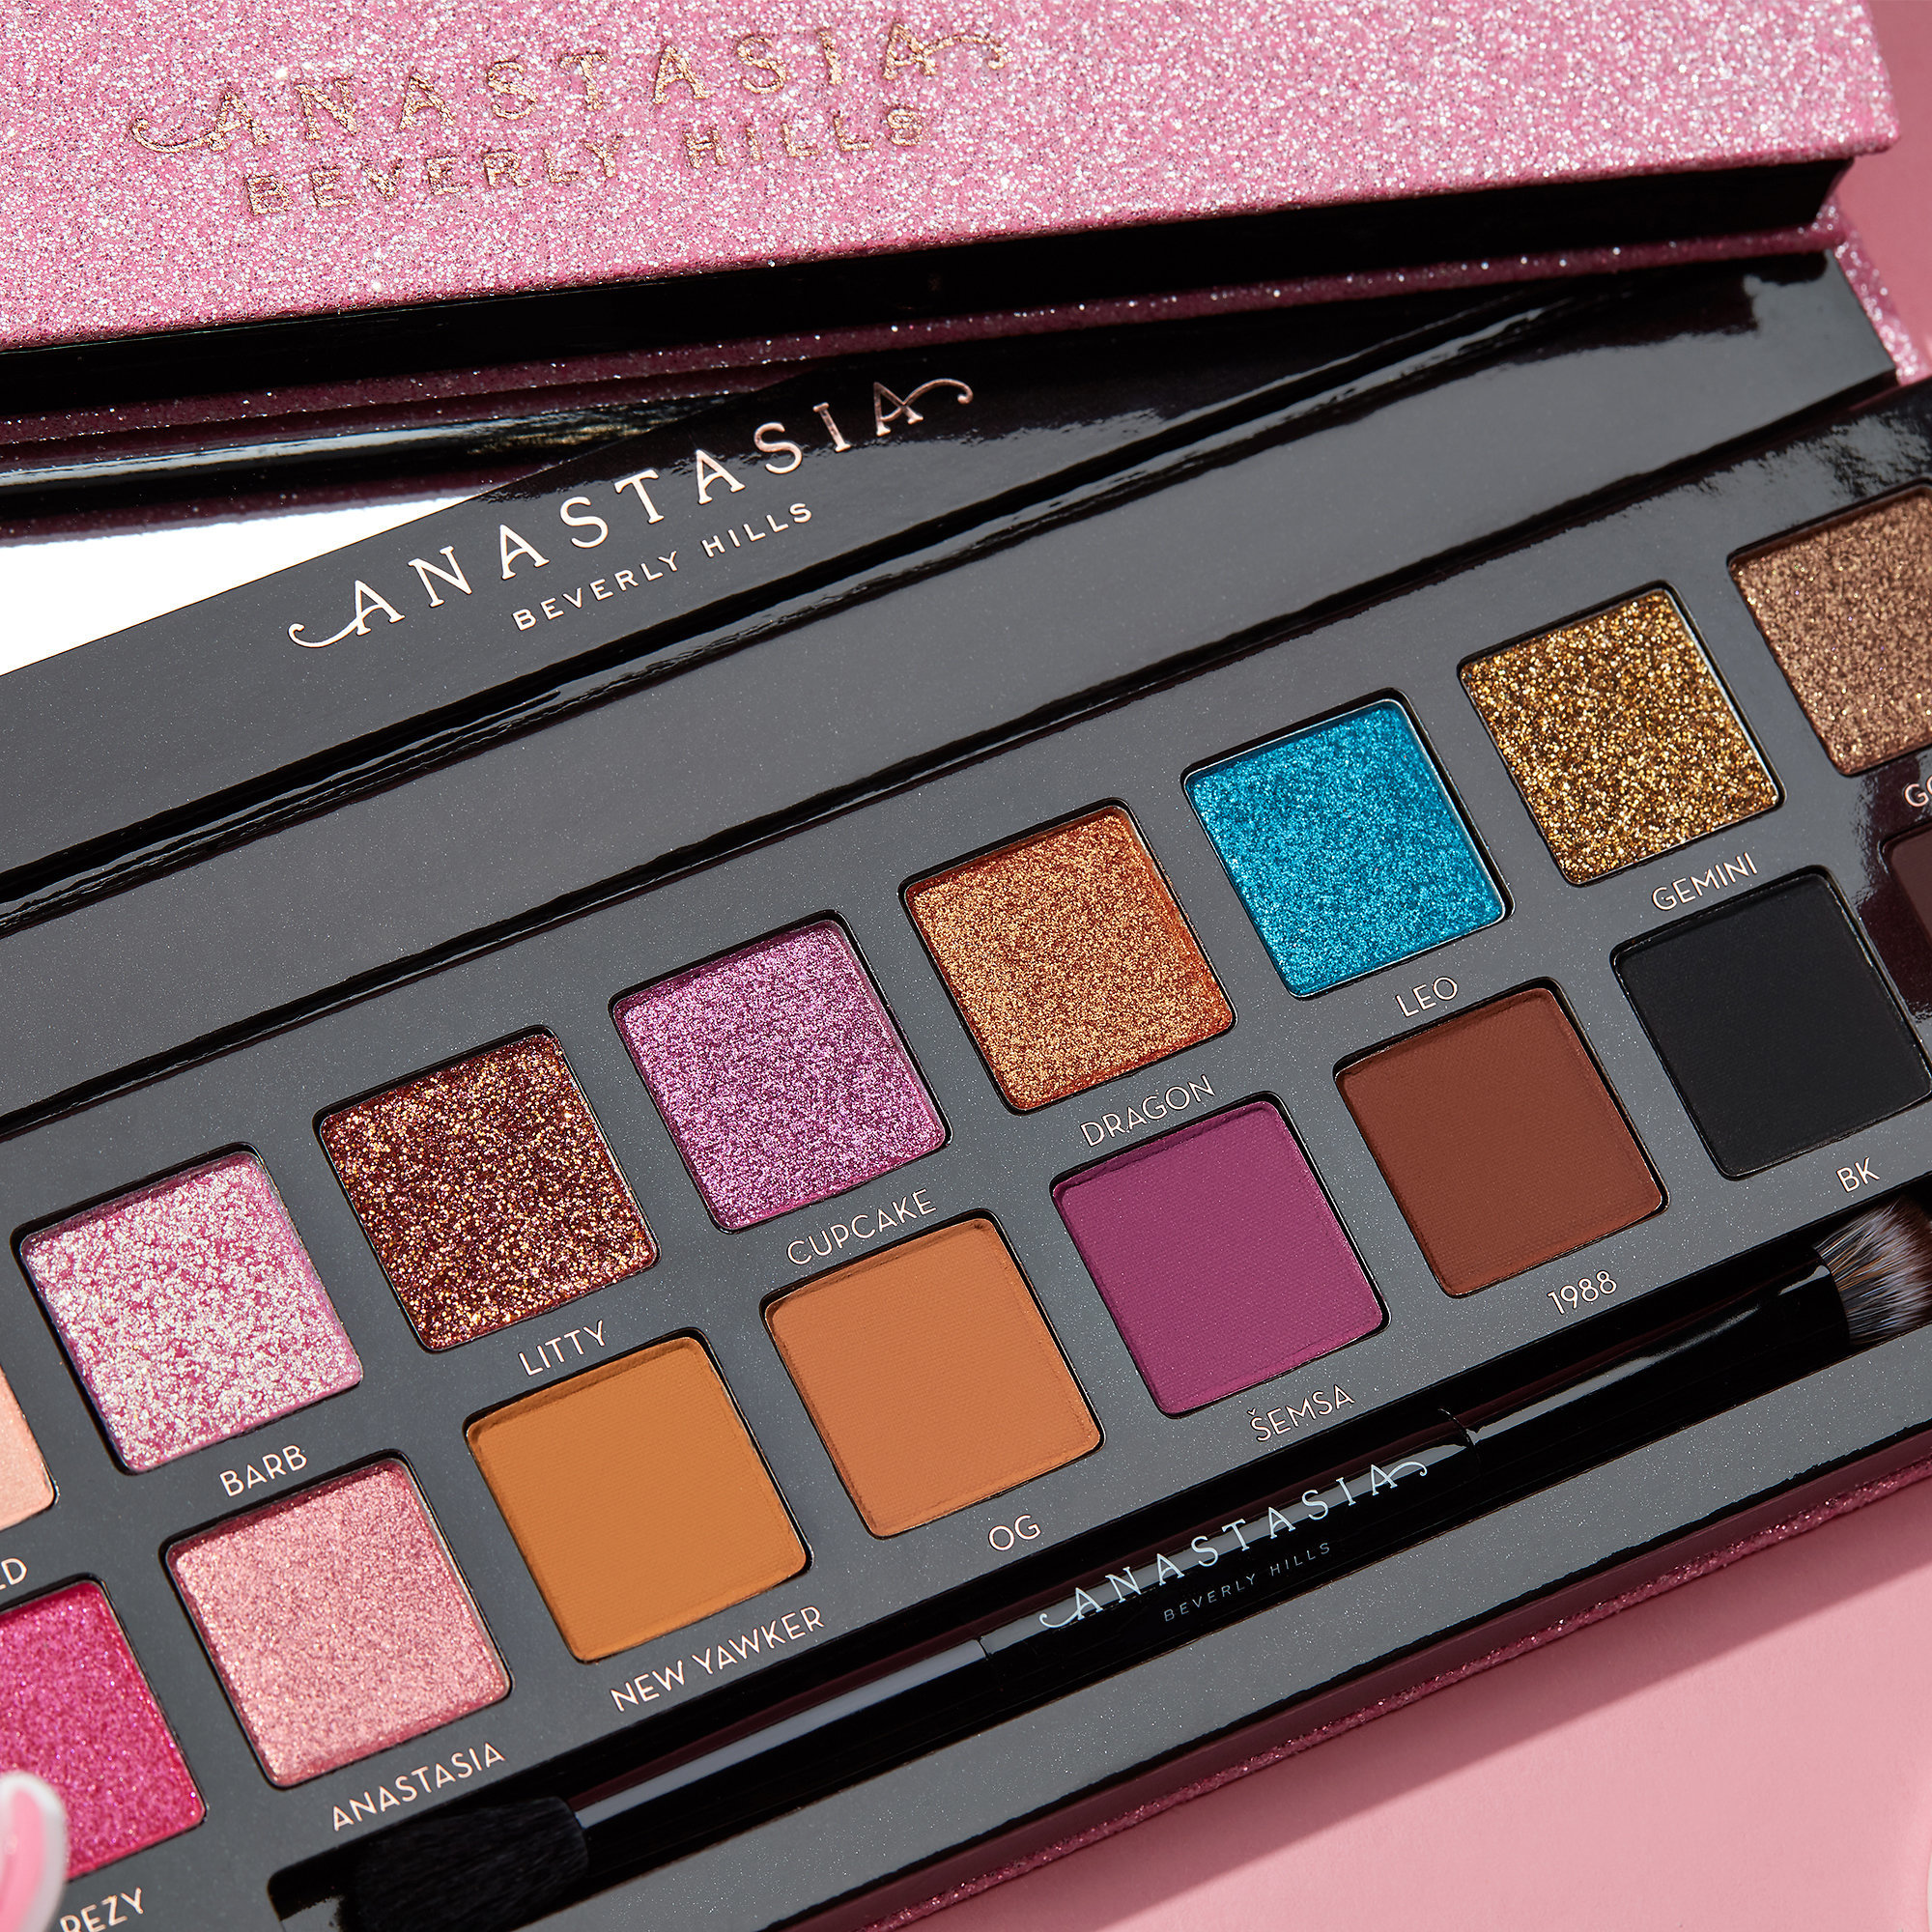 Anastasia Beverly Hills Amrezy palette